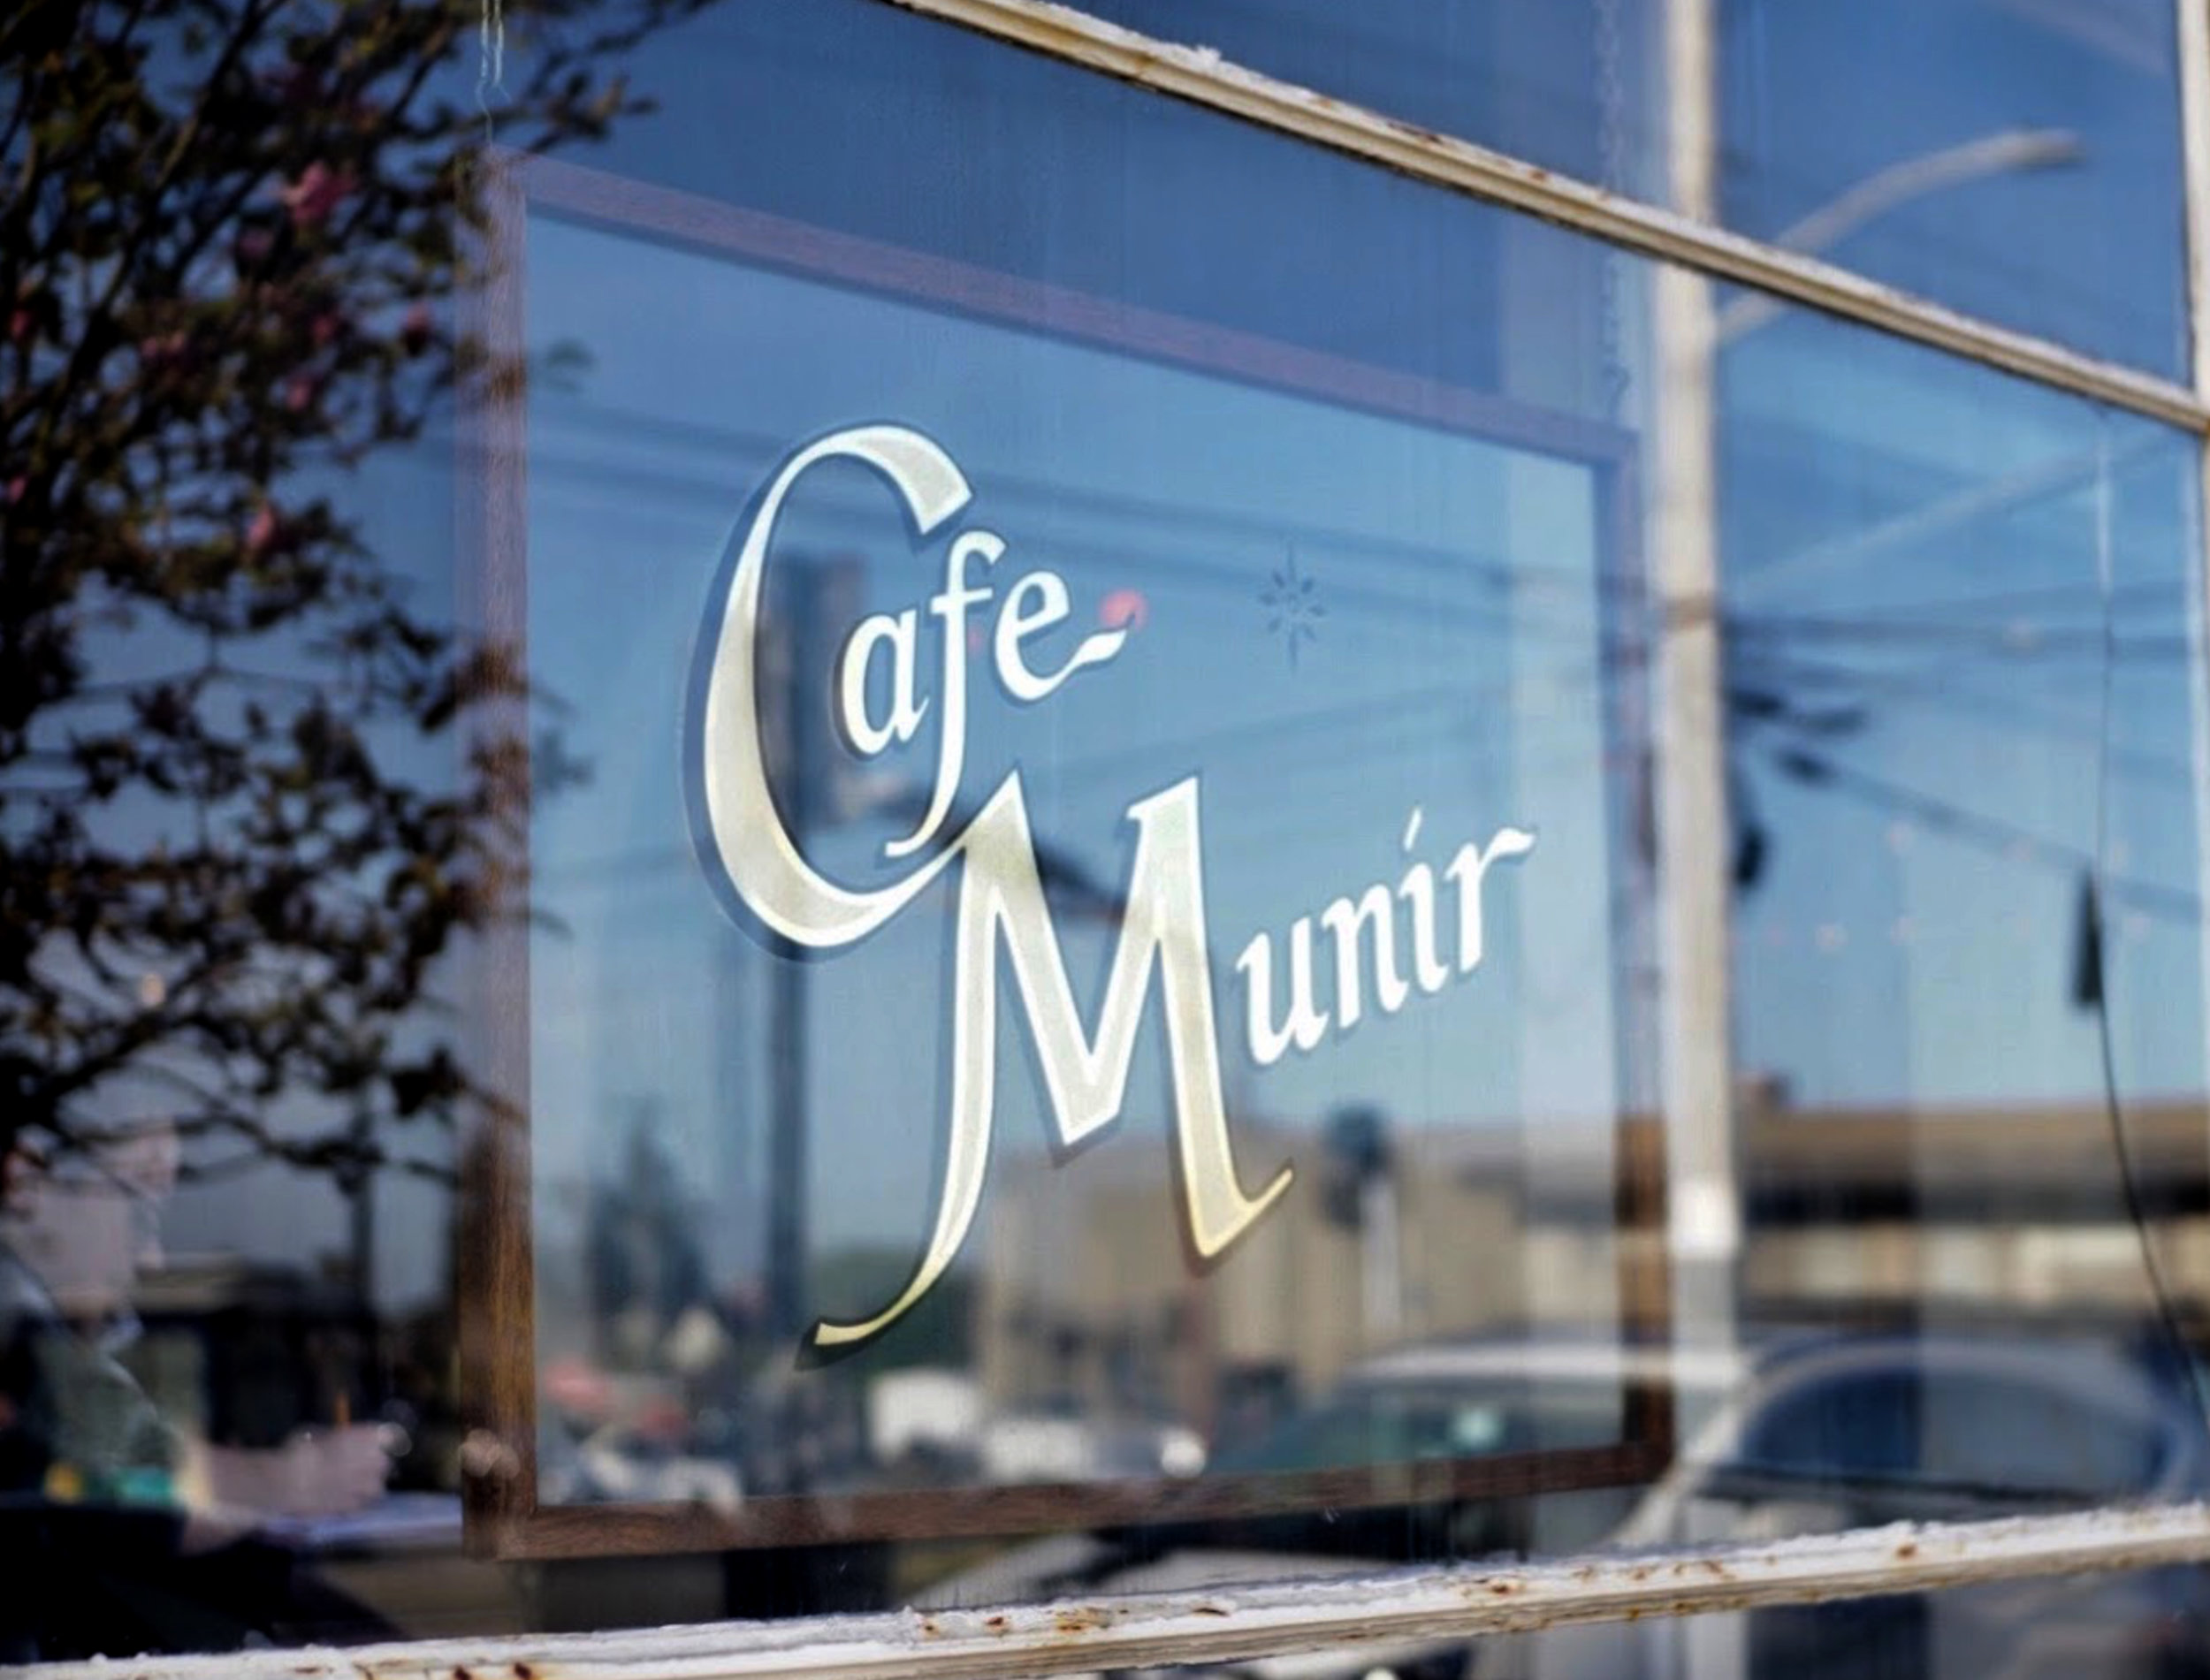 Cafe Munir